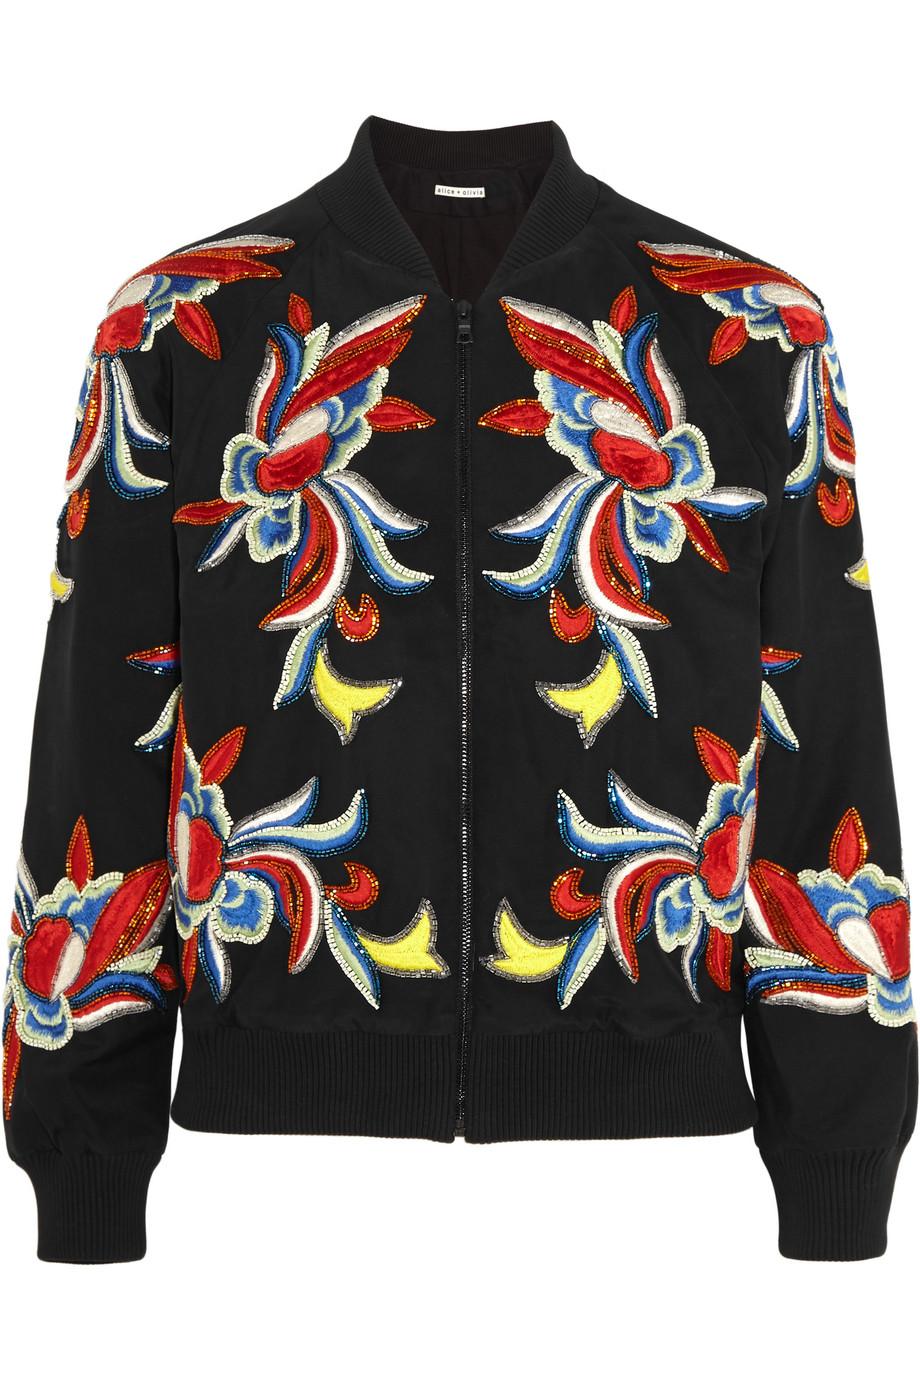 Alice + Olivia Felisa Embellished Embroidered Silk Bomber Jacket, Black, Women's